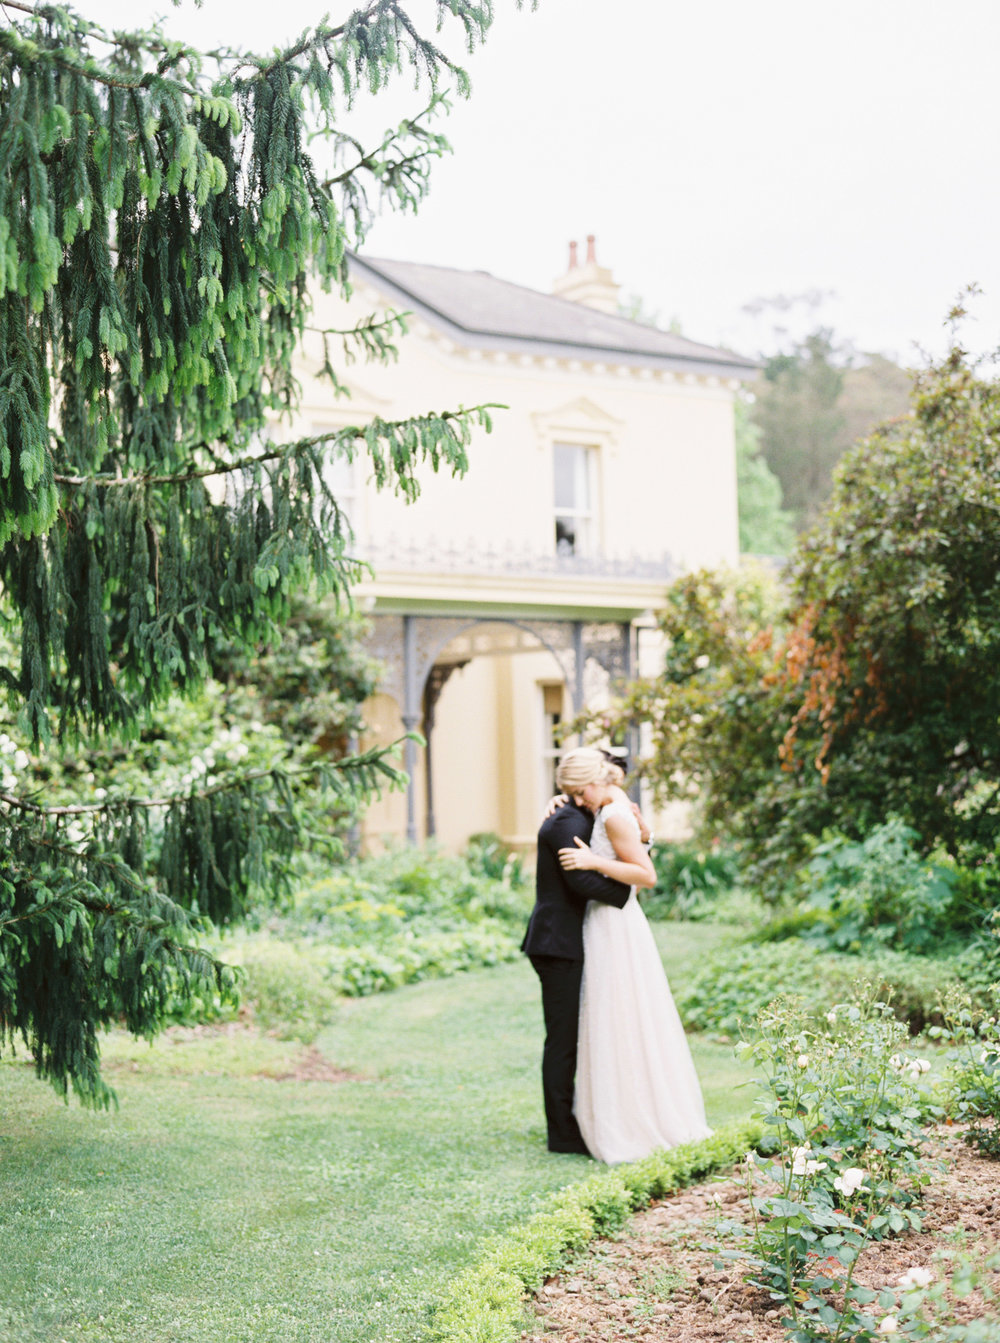 Timeless Southern Highland Wedding Elopement in Bowral NSW Fine Art Film Photographer Sheri McMahon-44.jpg